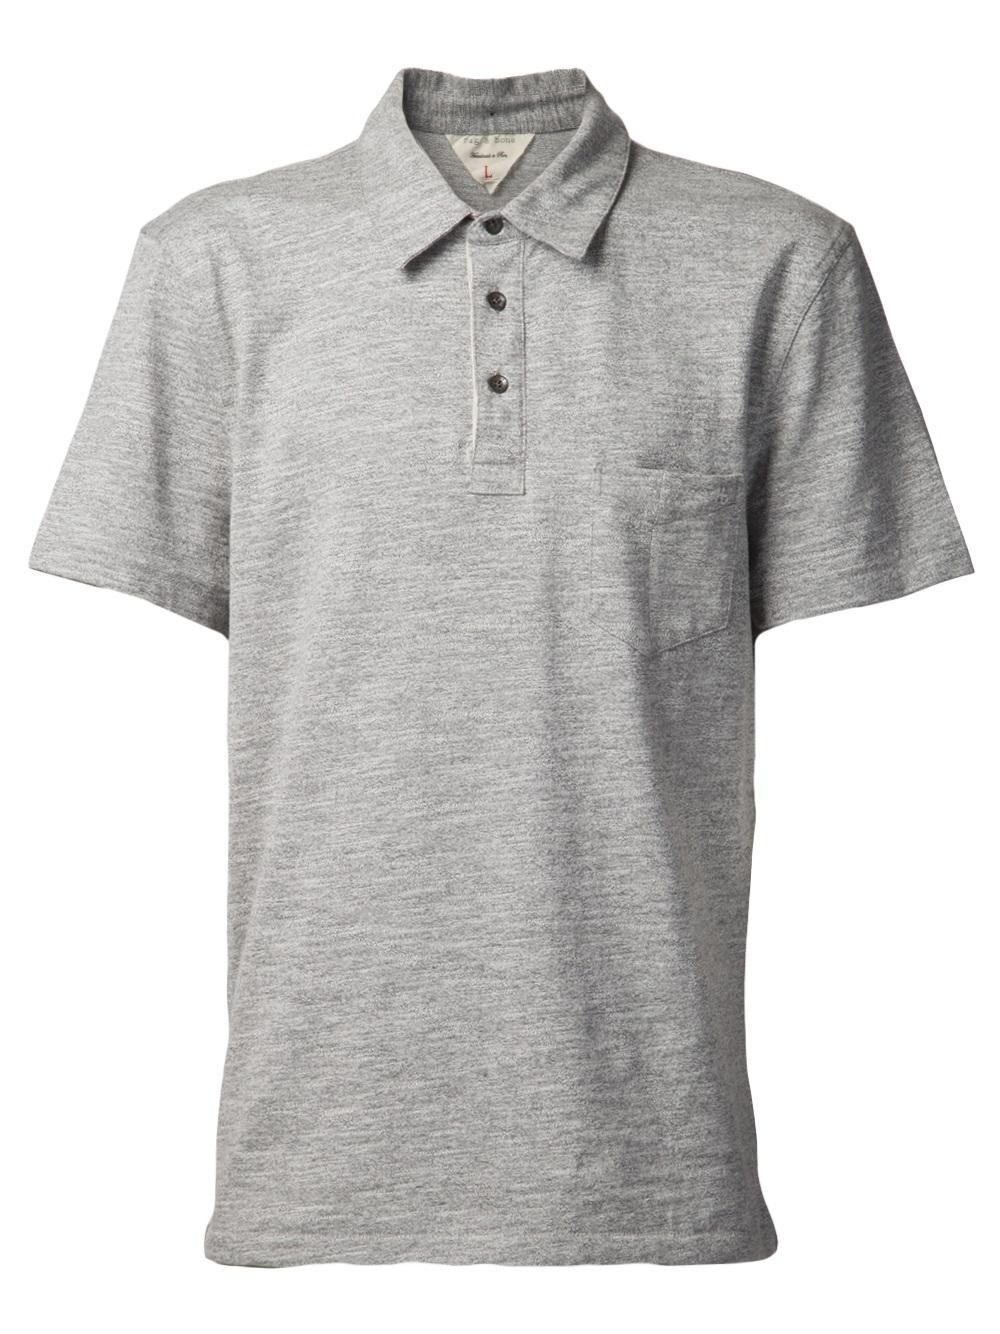 Rag Amp Bone Patch Pocket Polo Shirt In Gray For Men Grey